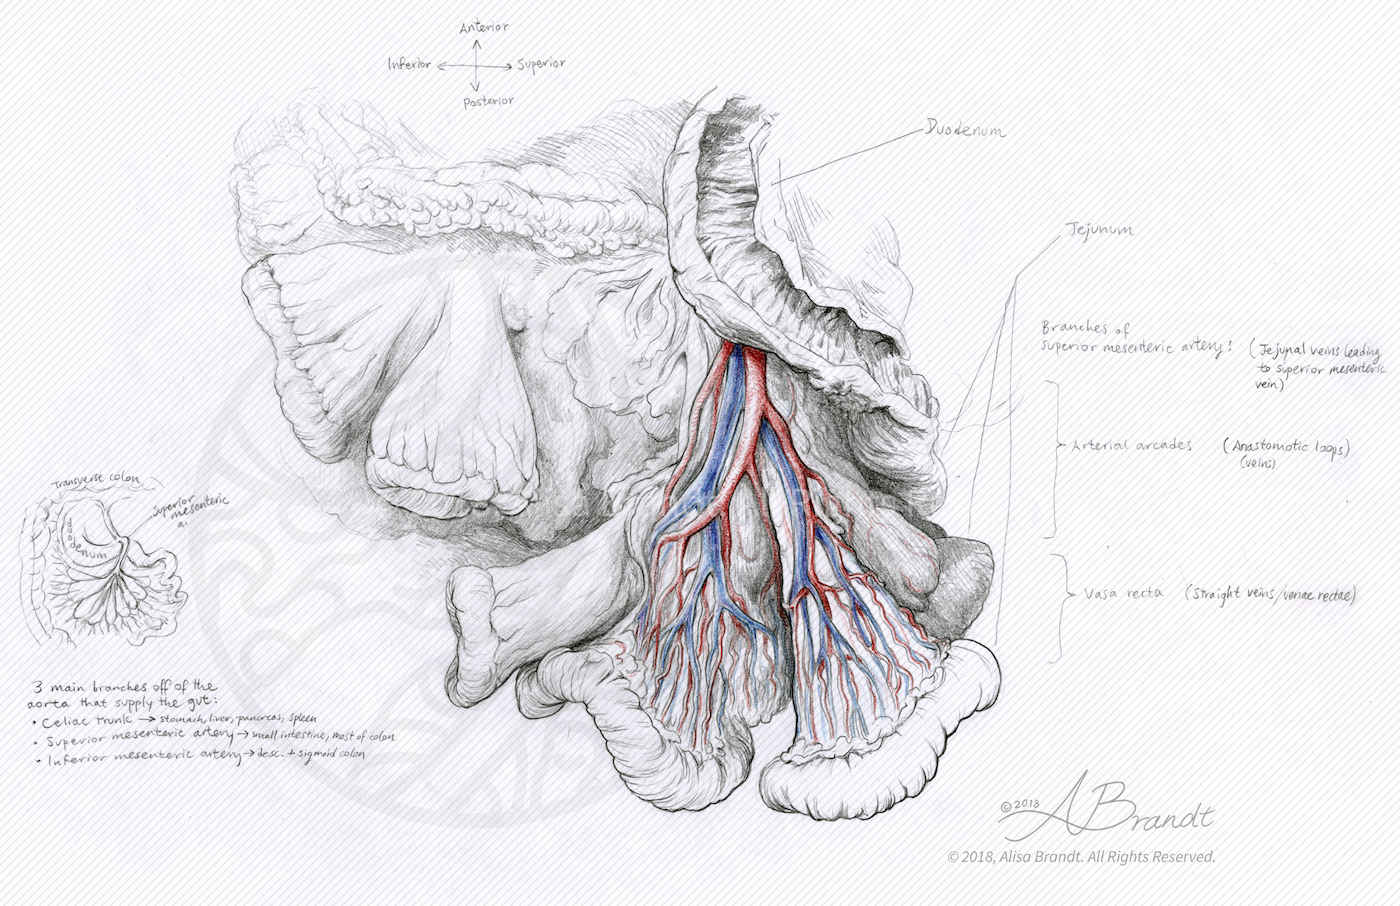 hight resolution of small intestine mesentery sketch